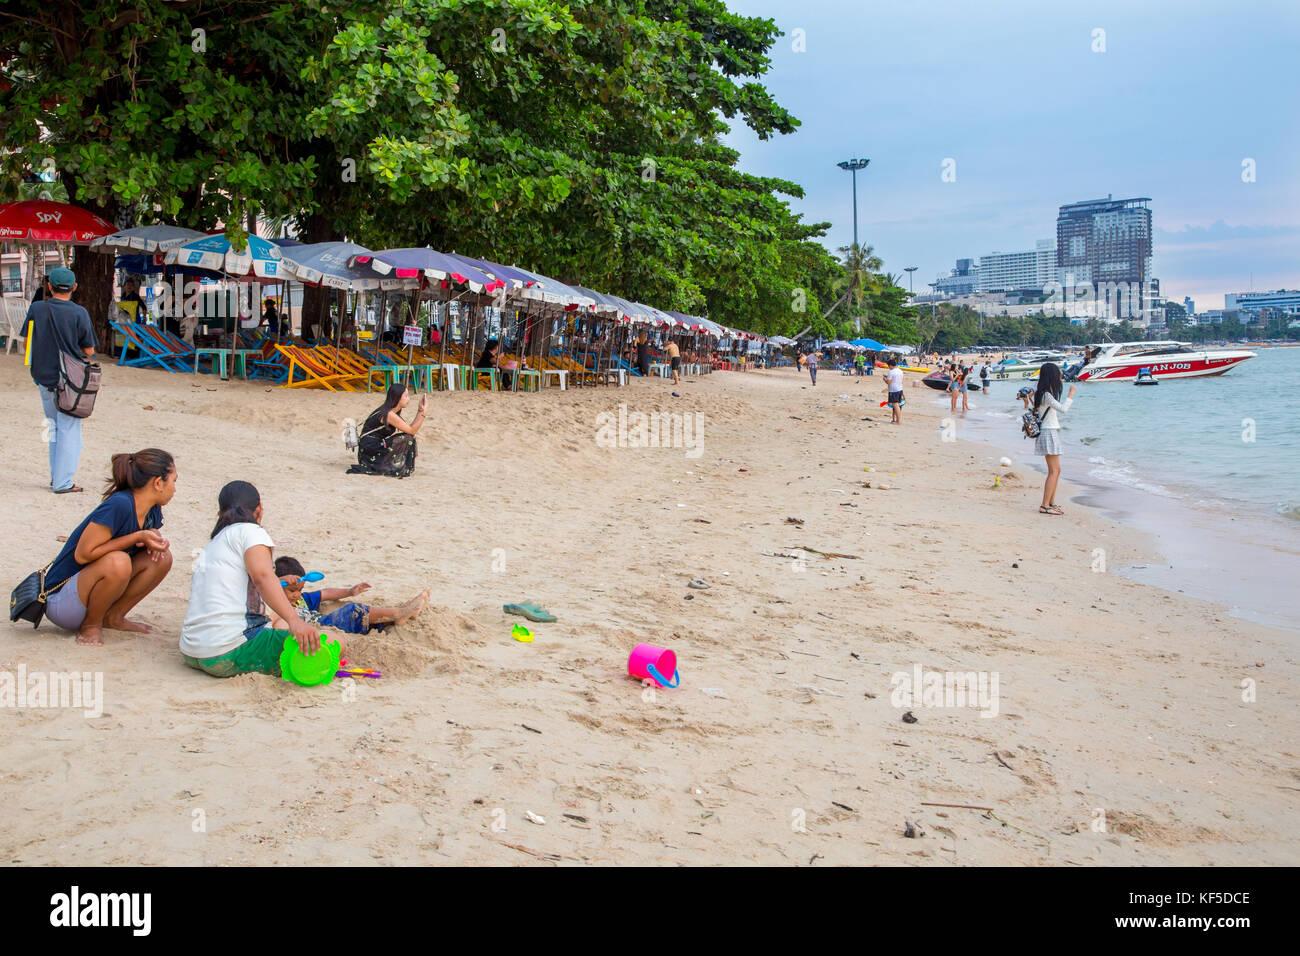 La playa de Pattaya, Pattaya, Tailandia Foto de stock